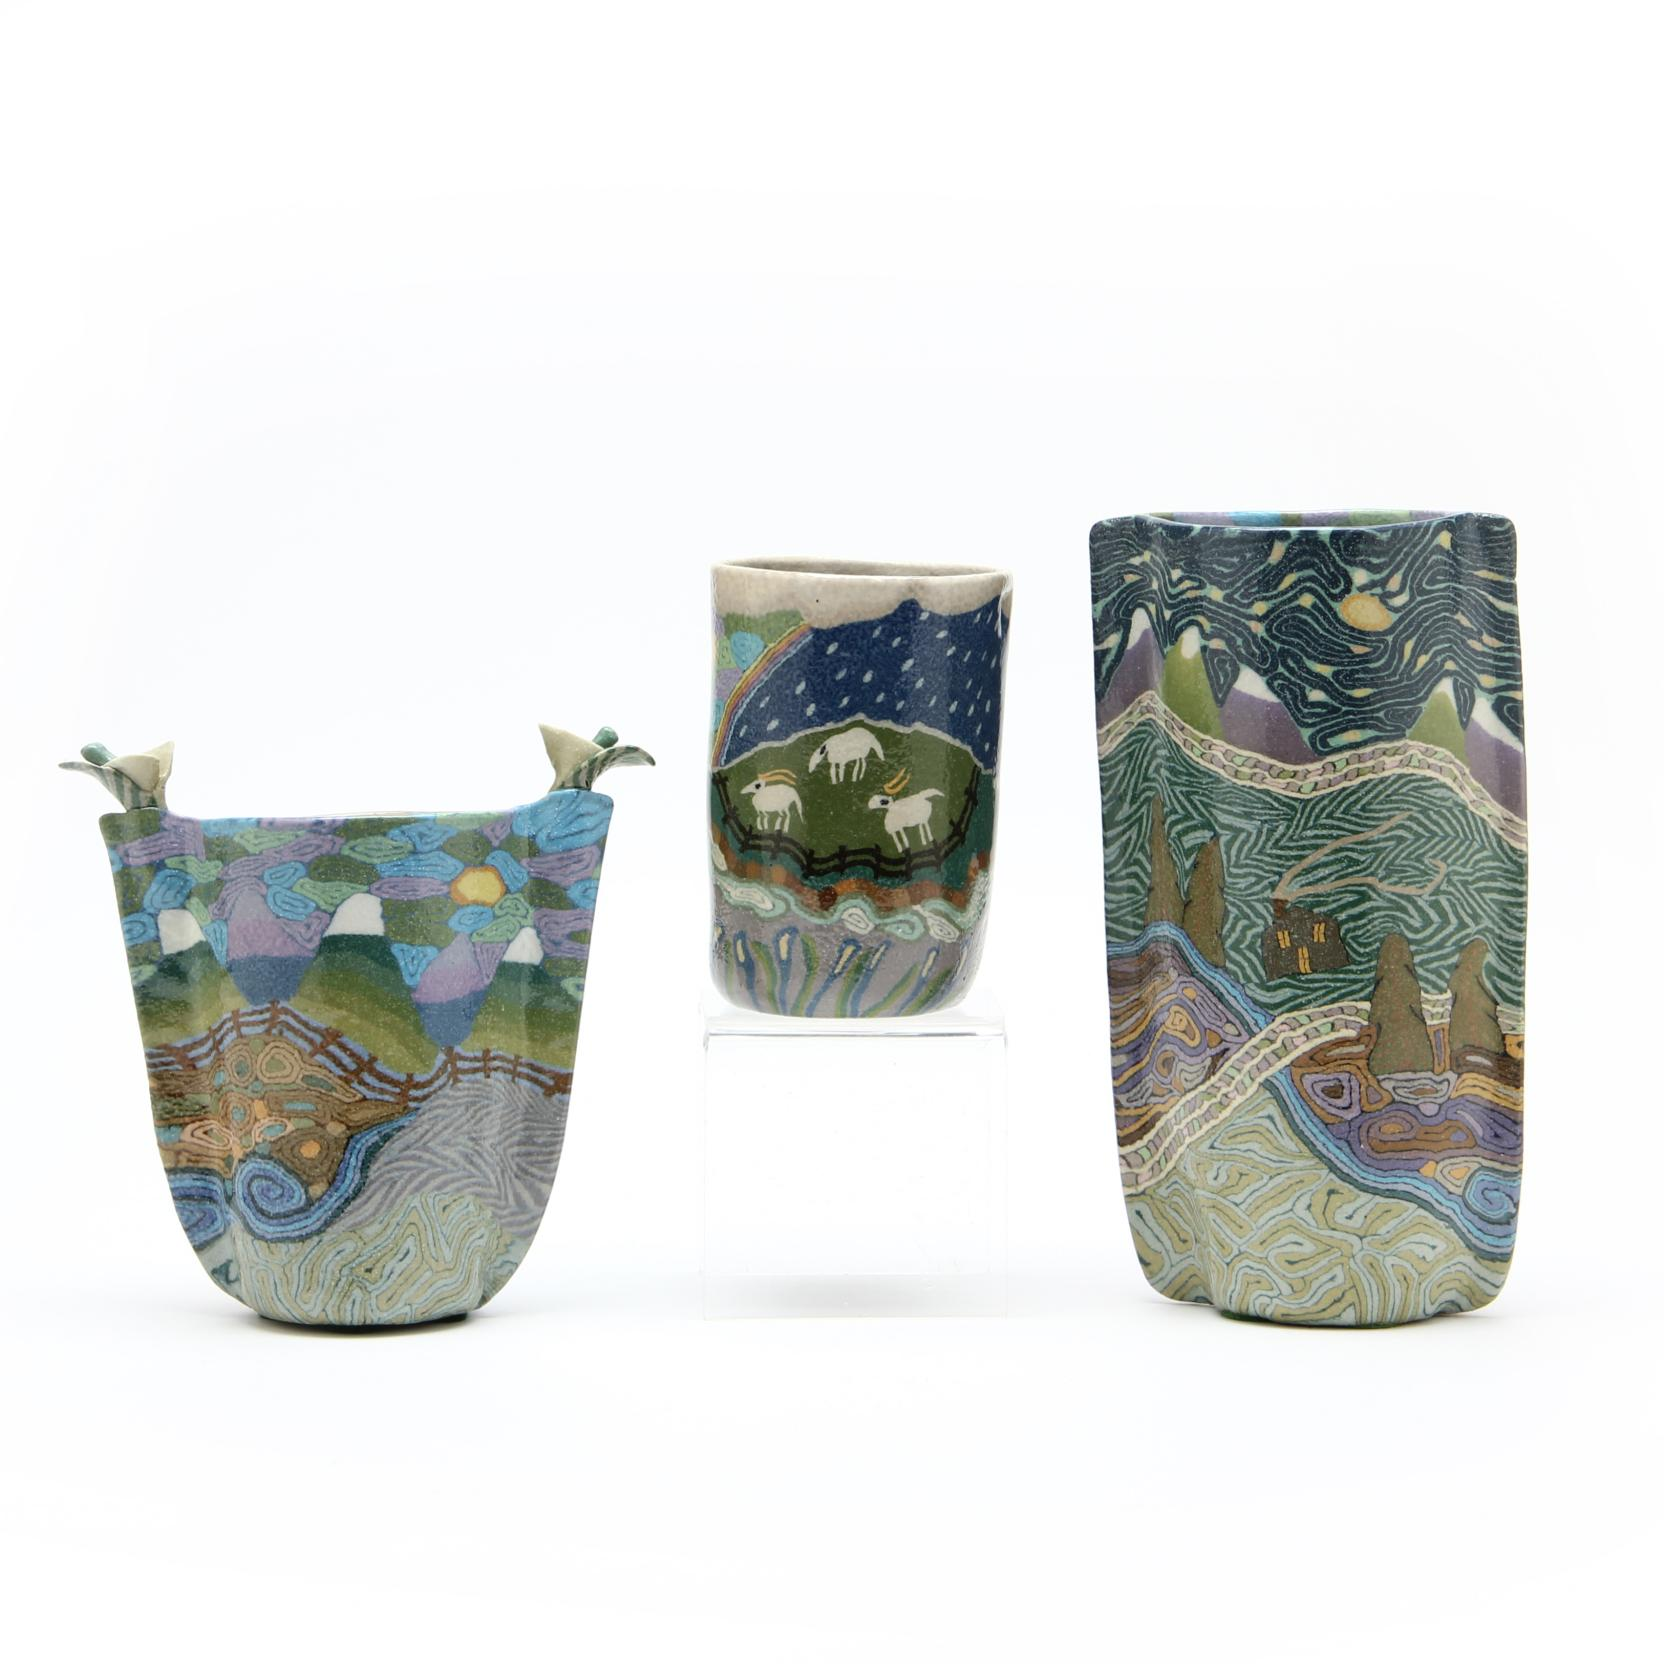 three-nc-folk-art-pottery-vessels-jane-peiser